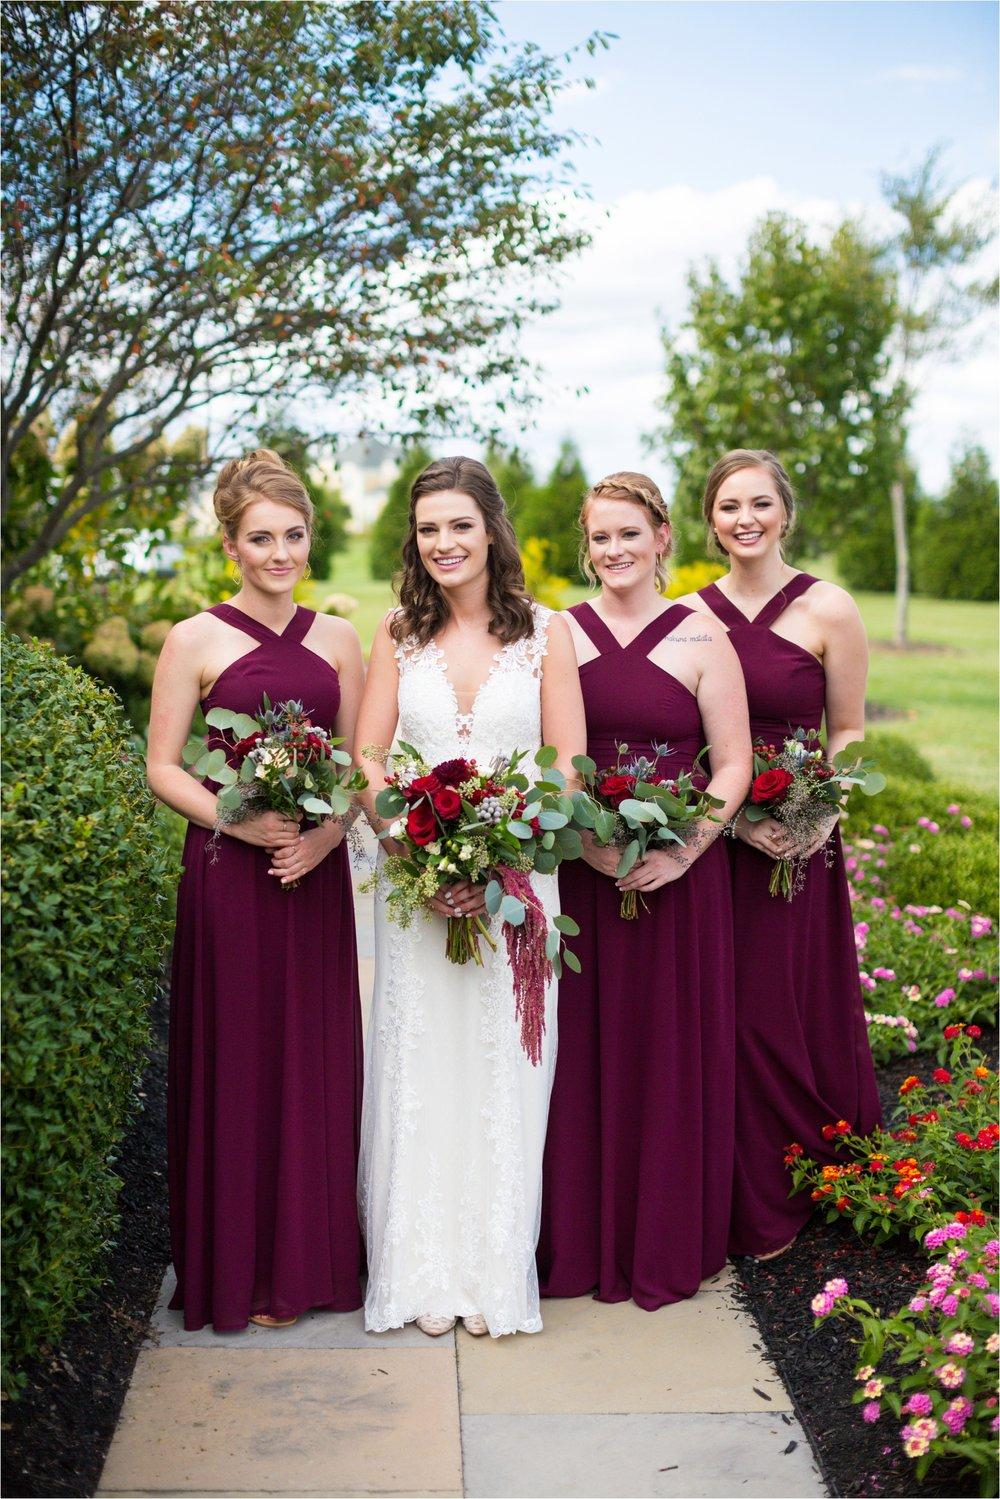 Feather-and-Oak-Photography-Cross-Keys-Vineyard-Wedding-0526.jpg